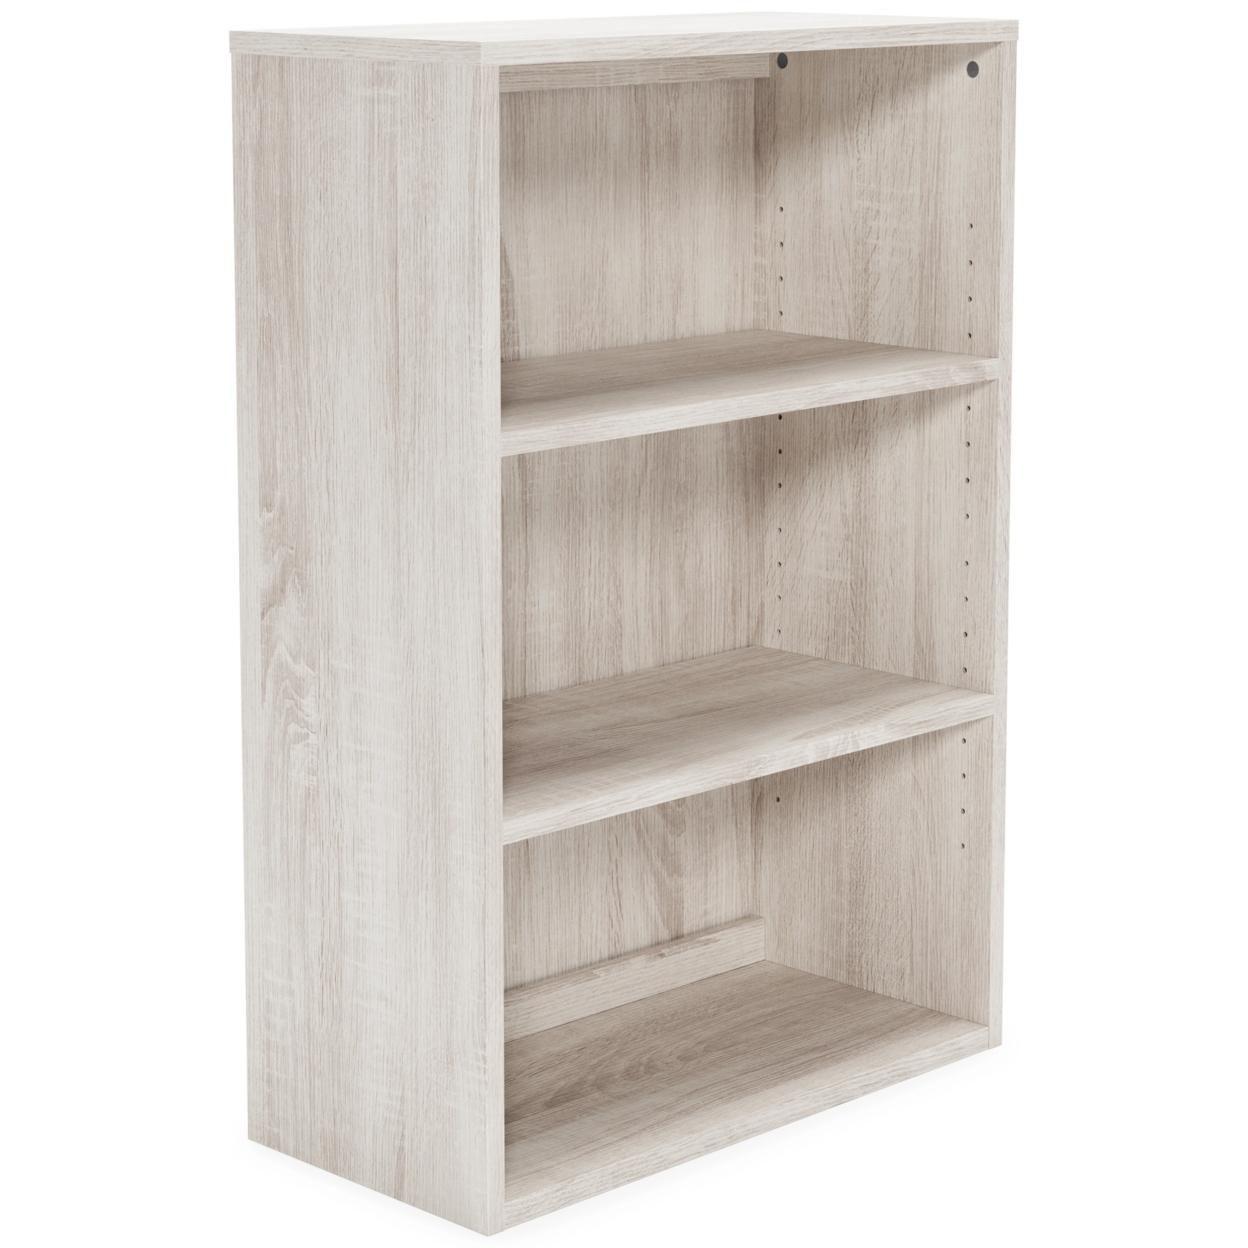 Medium Bookcase with 2 Adjustable Shelves, Antique White, Saltoro Sherpi